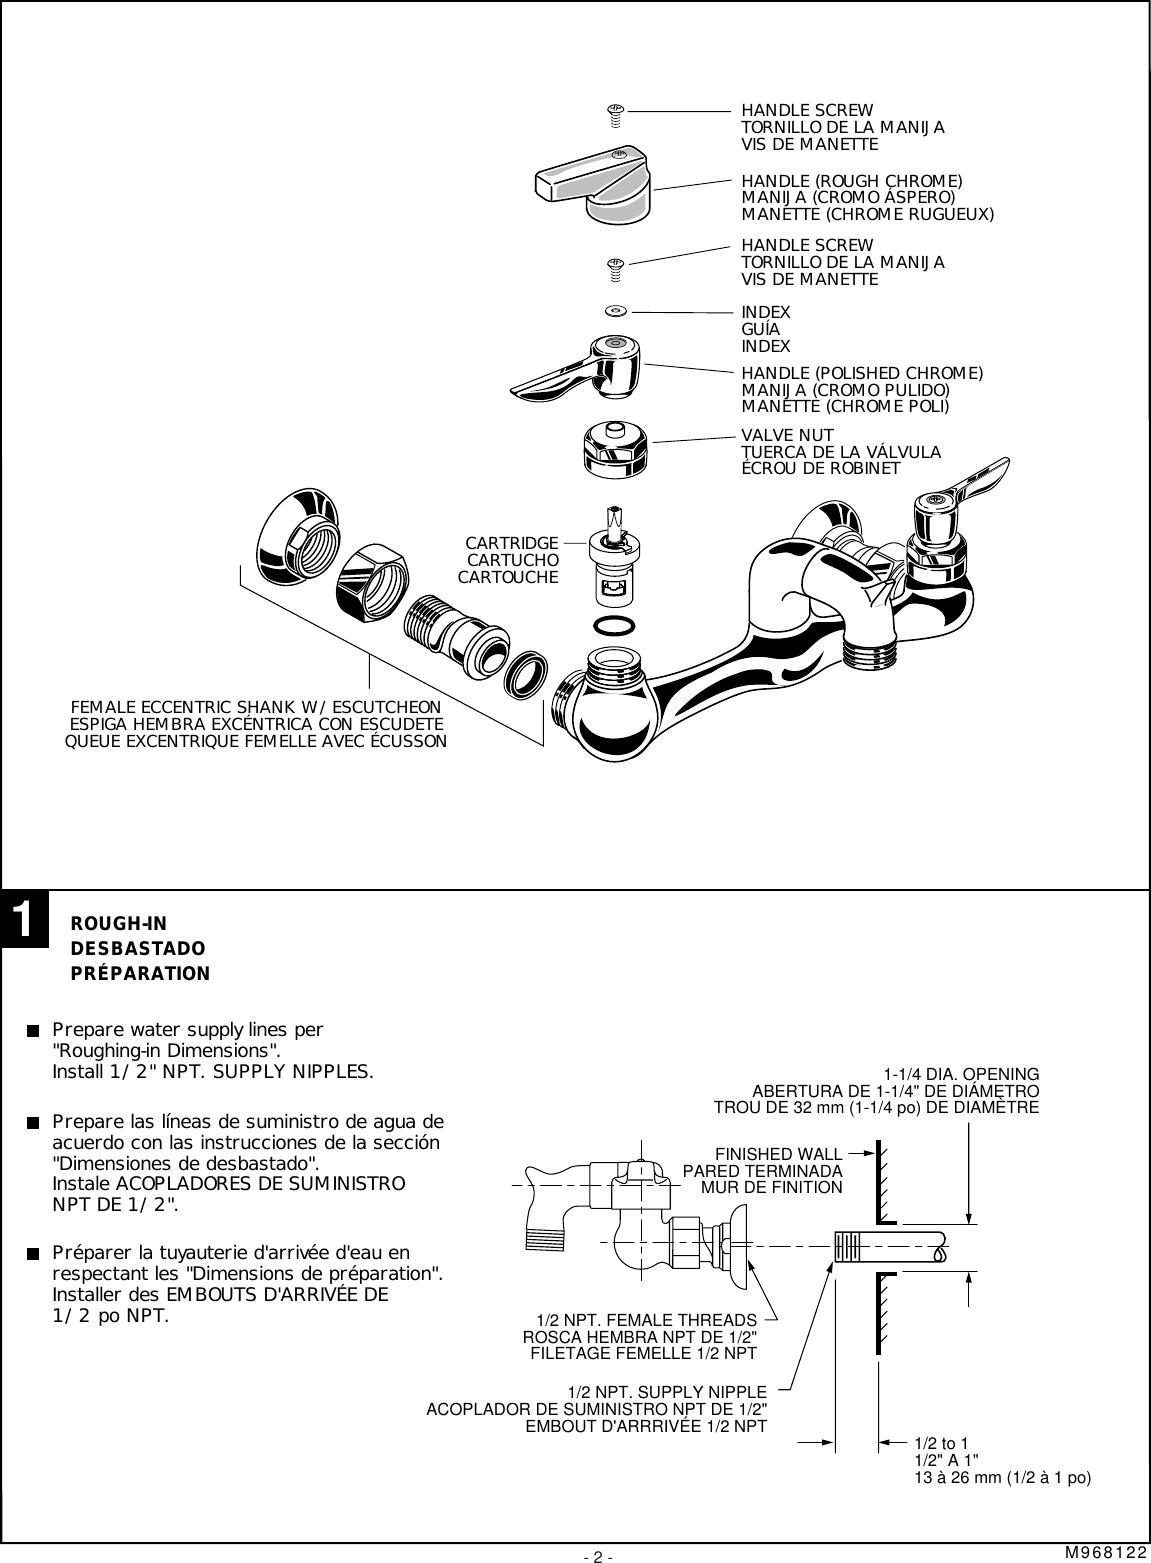 American Standard 8340 235 002 Users Manual